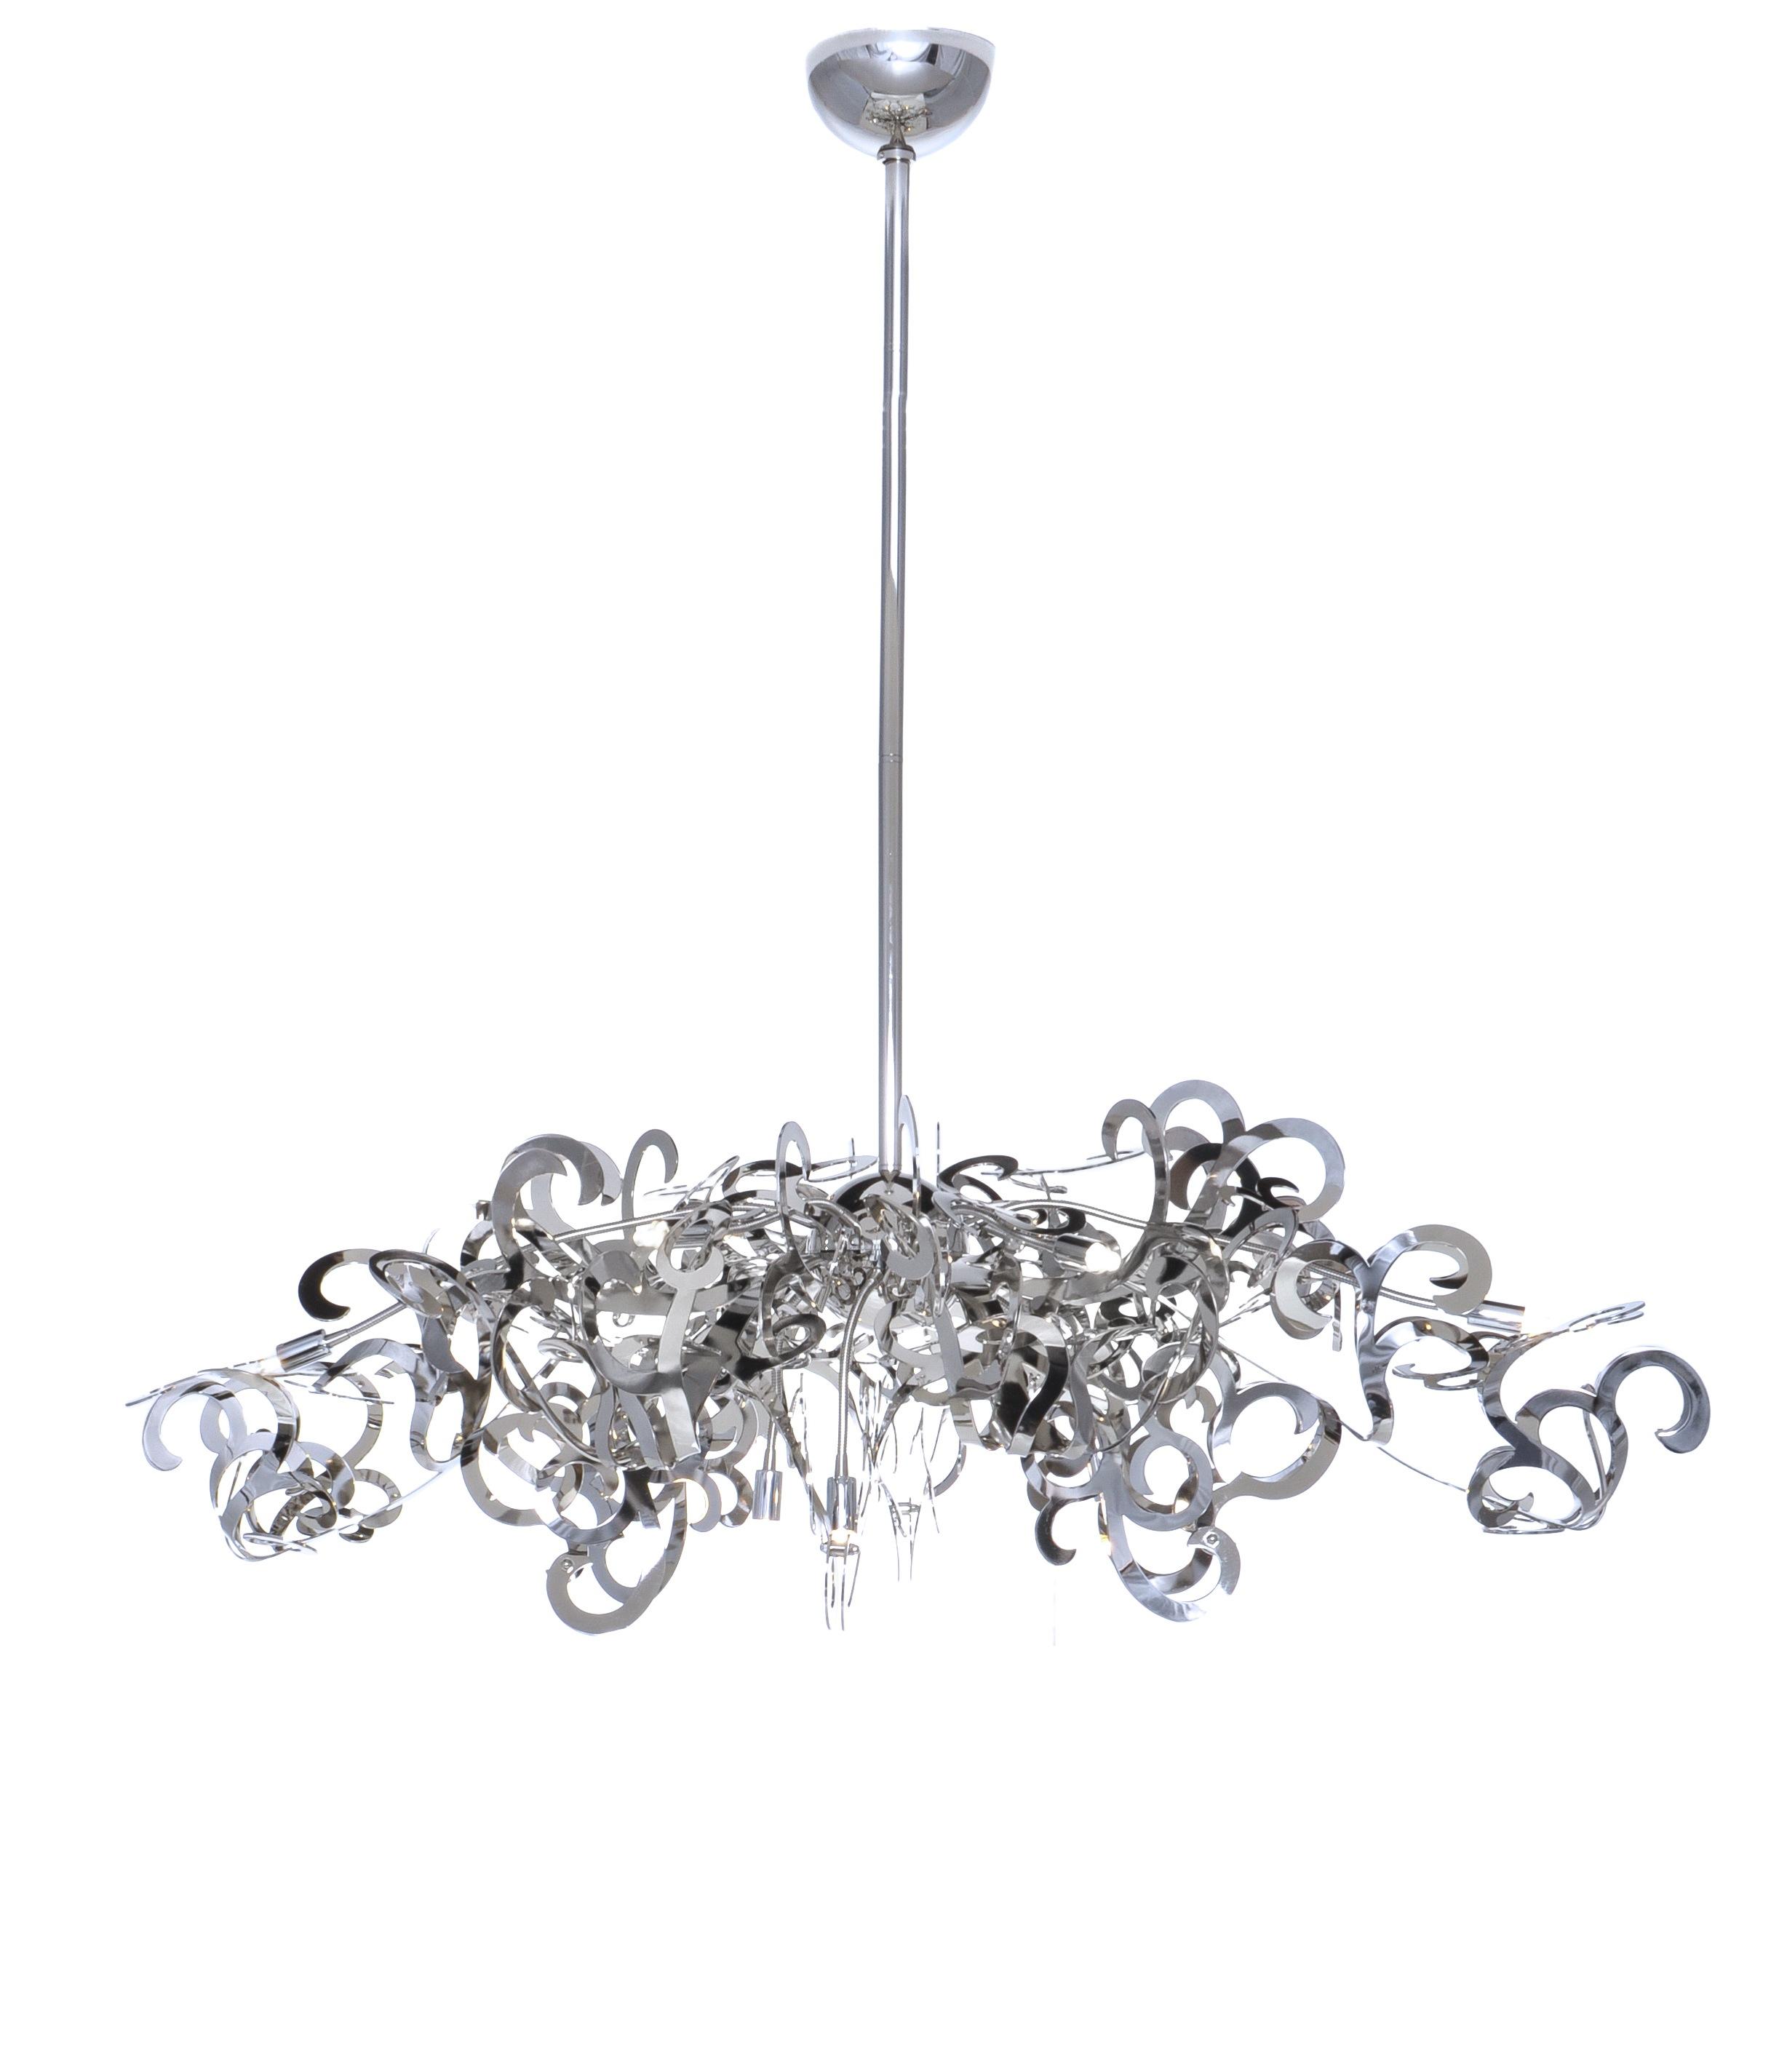 tempest 9-light chandelier